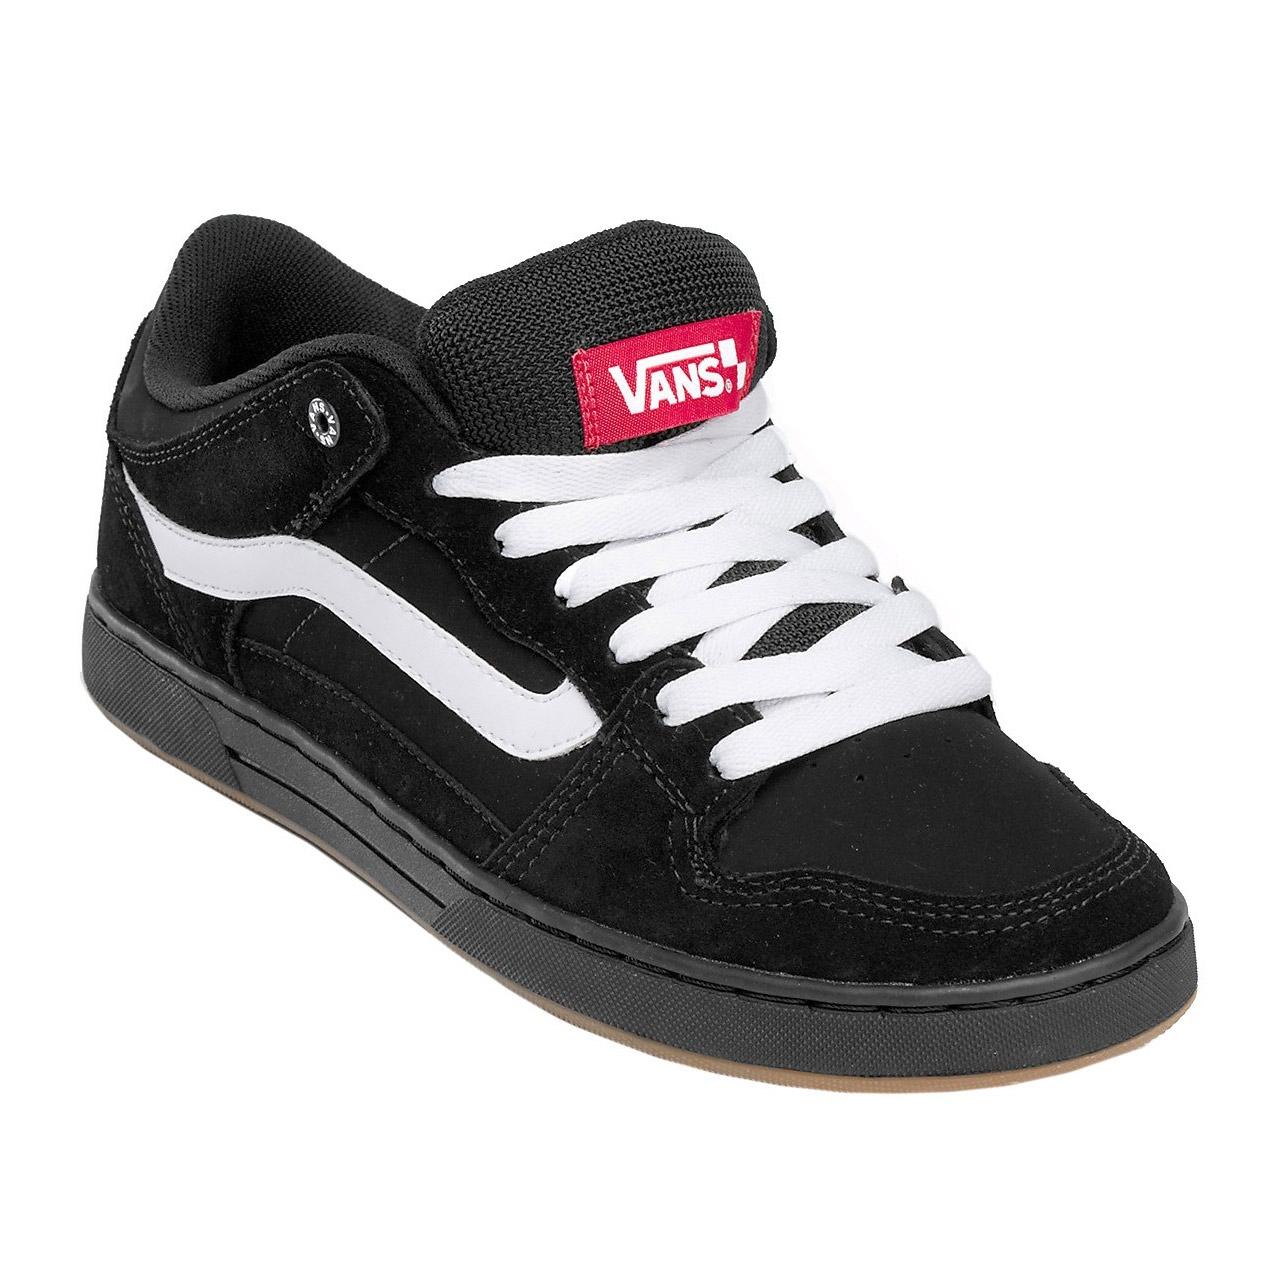 Vans Baxter Black White Gum Snowboard Zezula